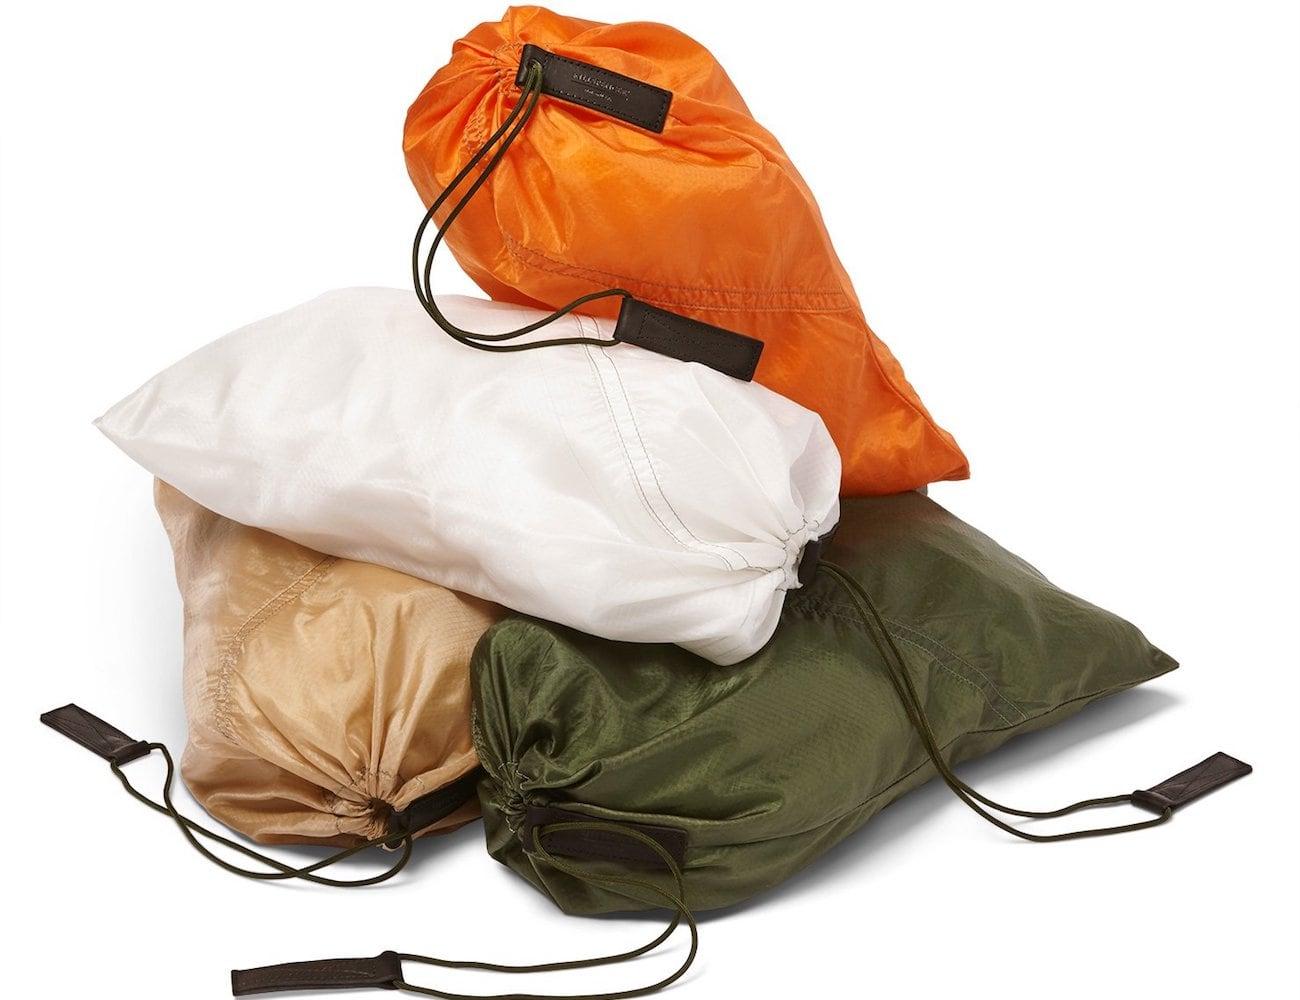 Killspencer Parachute 2.0 Drawstring Sports Bag